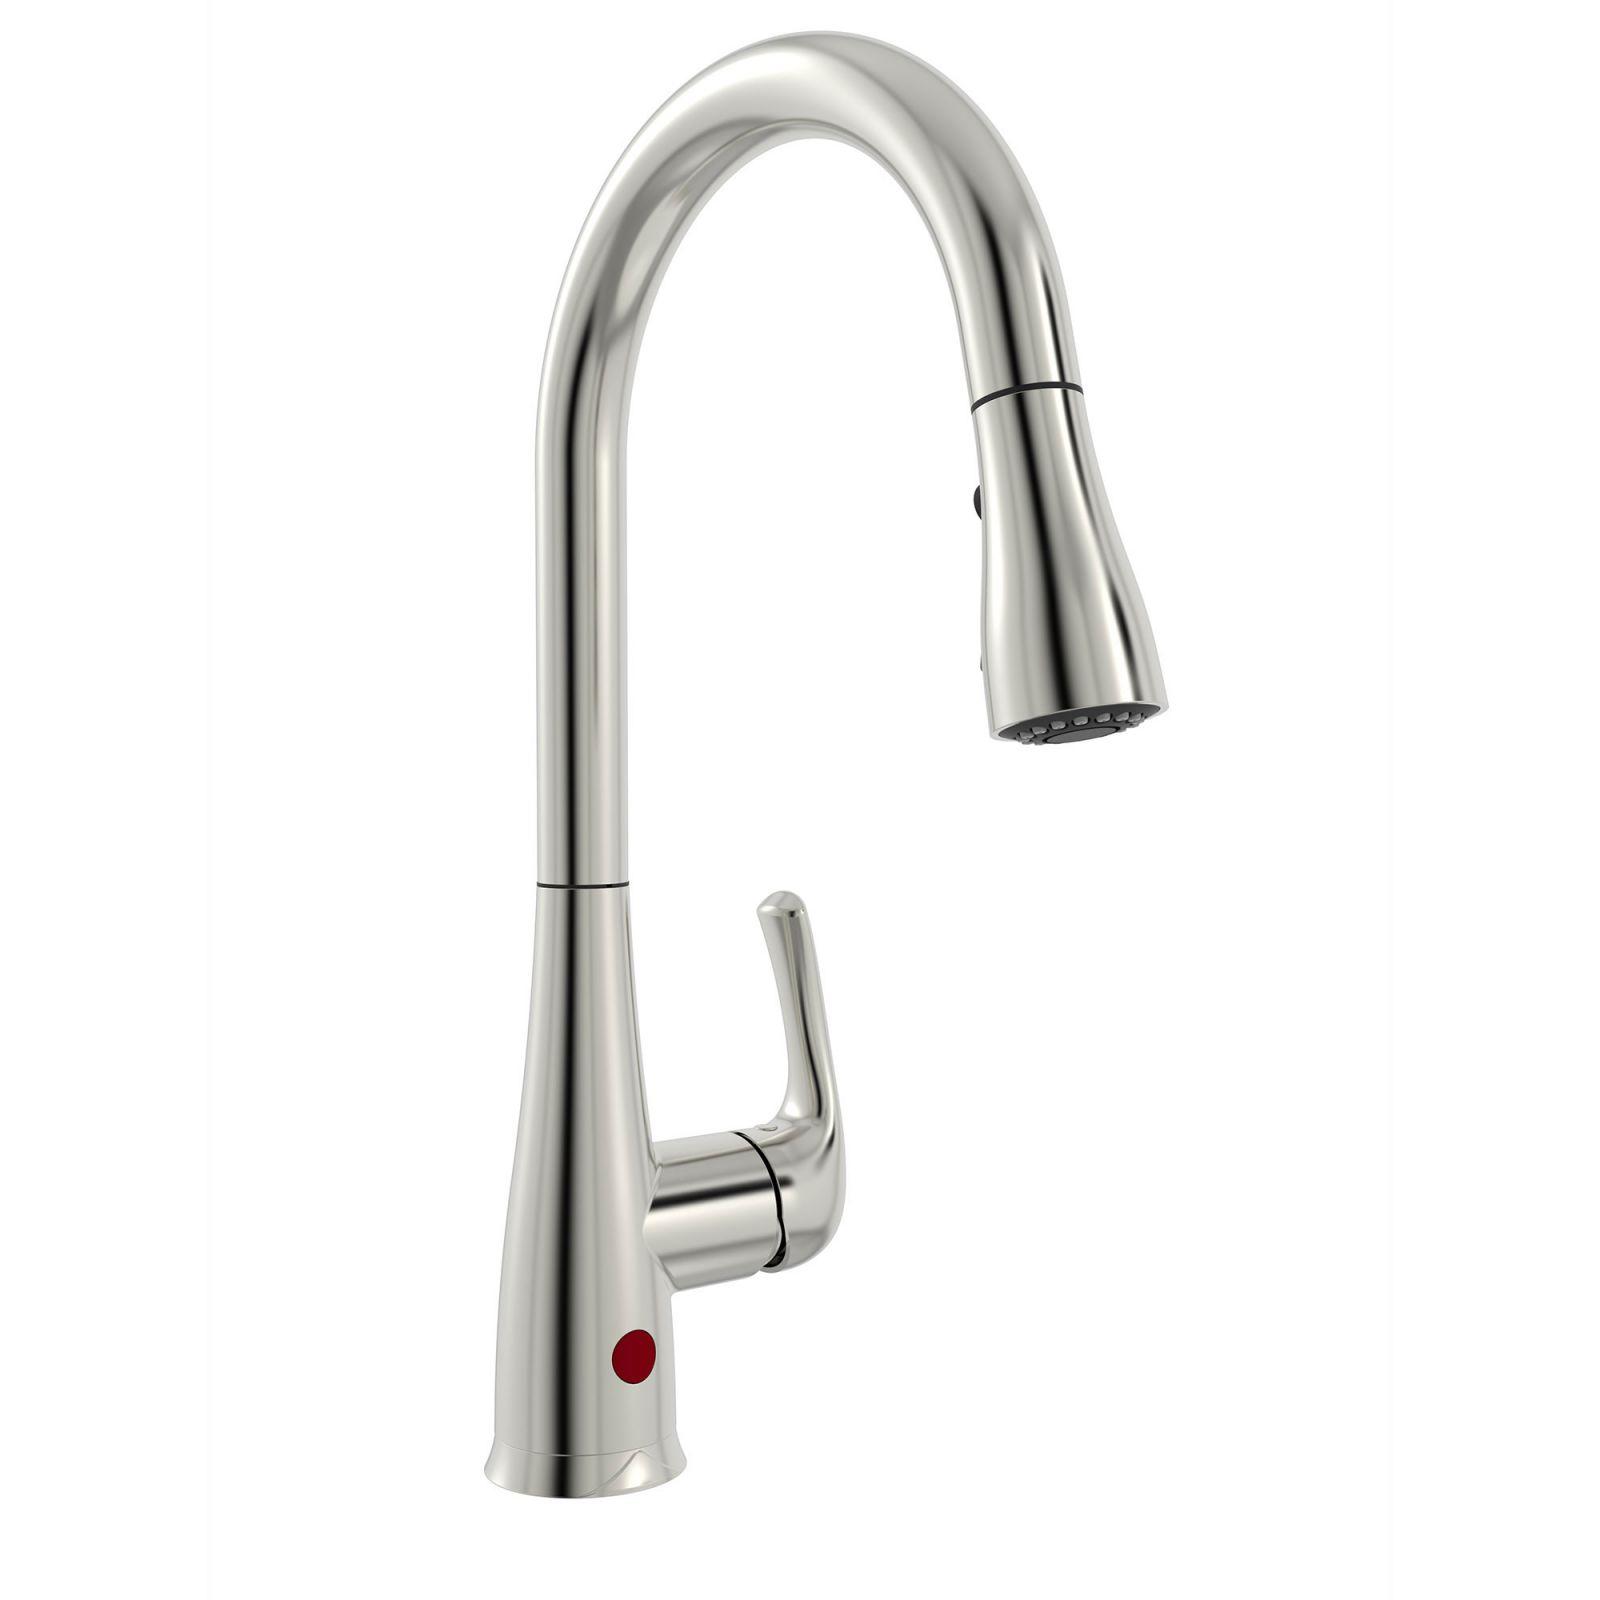 Belanger Nex76Cbn Pull Down Touchless Single Handle Kitchen Faucet In Brushed Nickel regarding New Touchless Kitchen Faucet